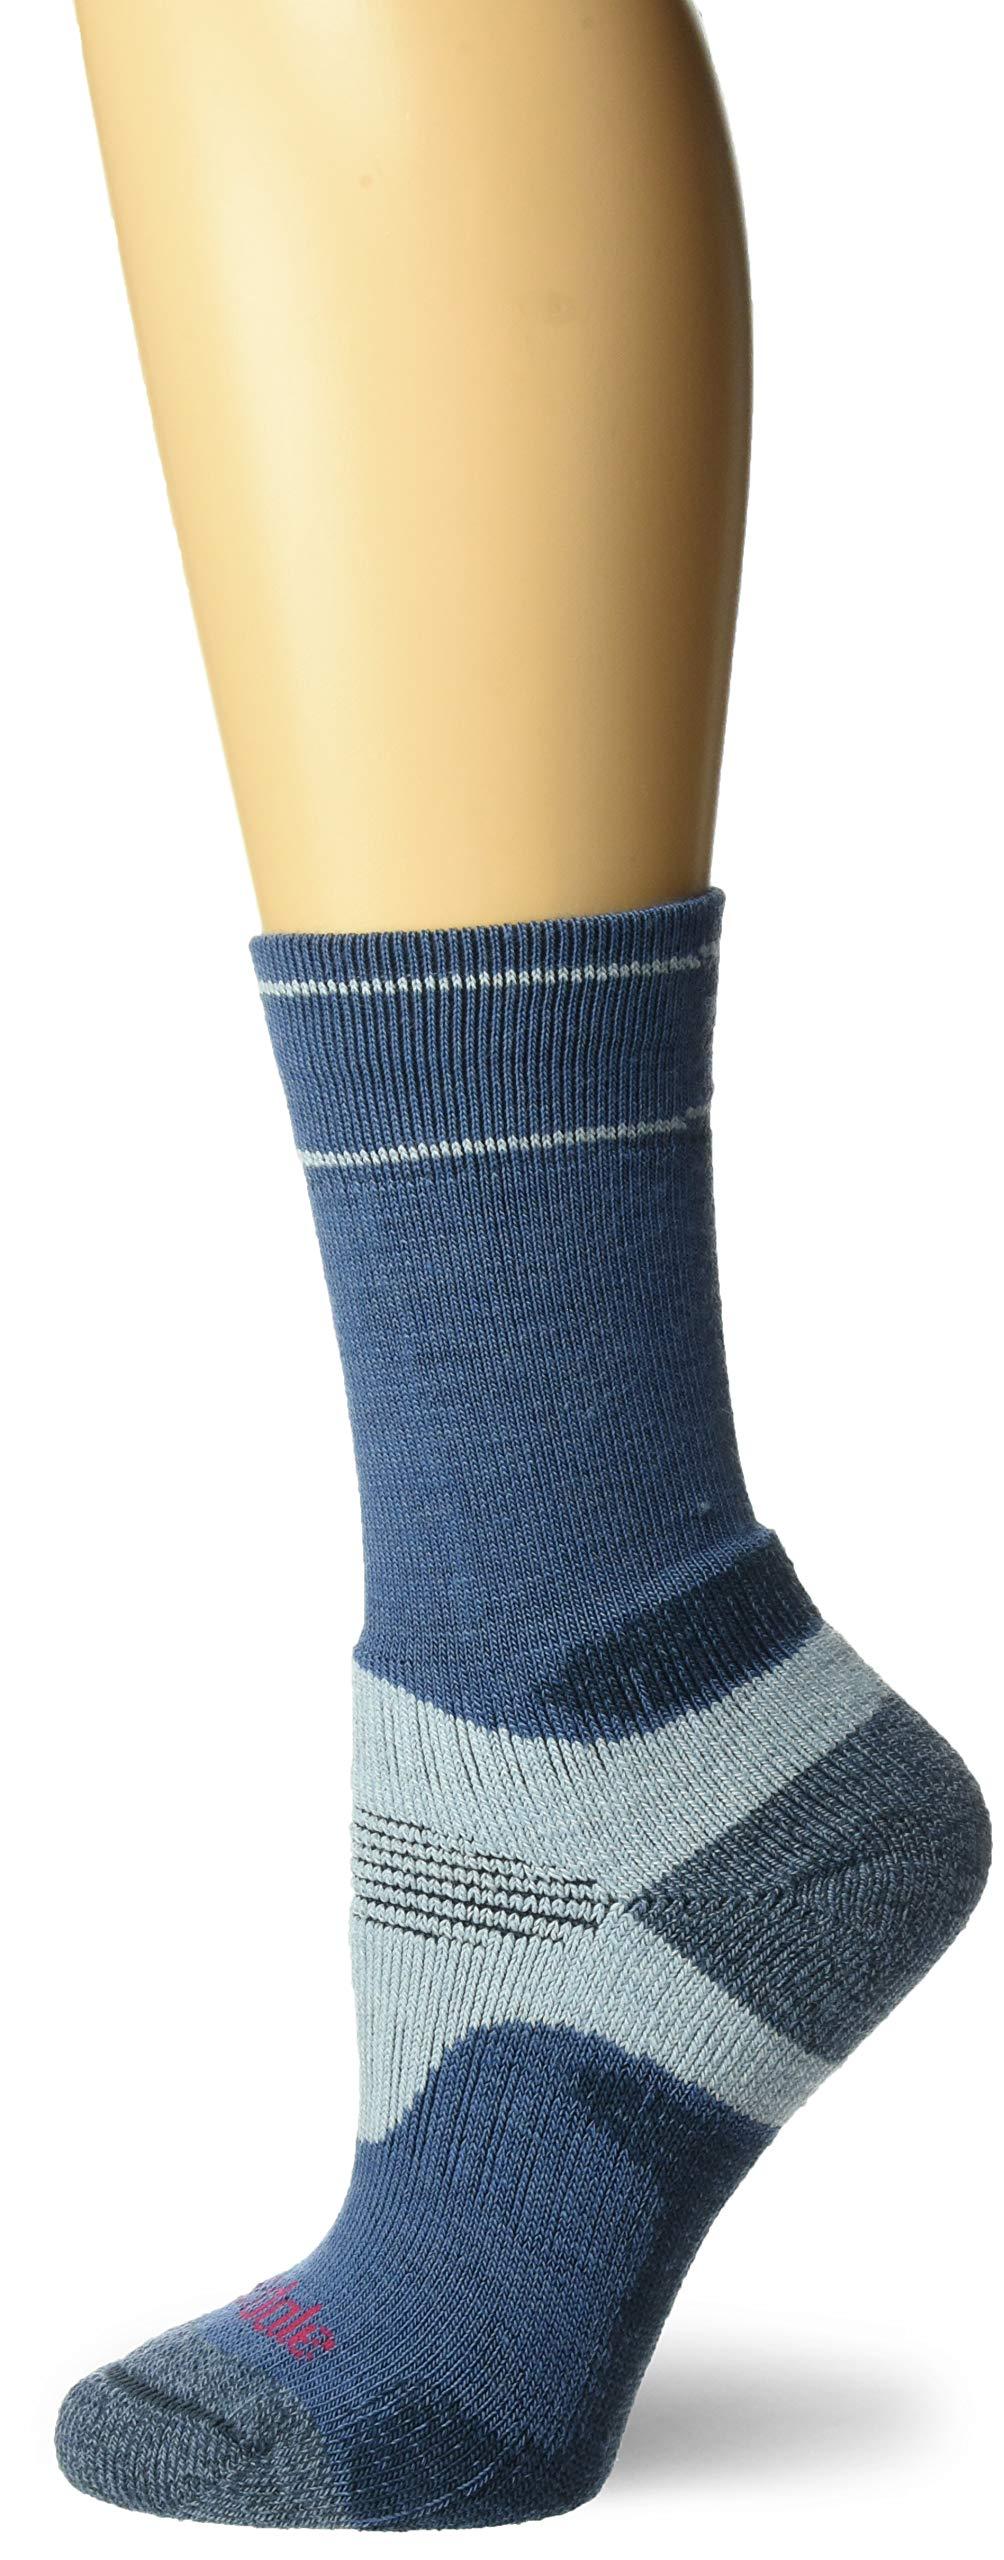 Bridgedale Women's Hike Midweight Boot Height- Merino Endurance Socks 1